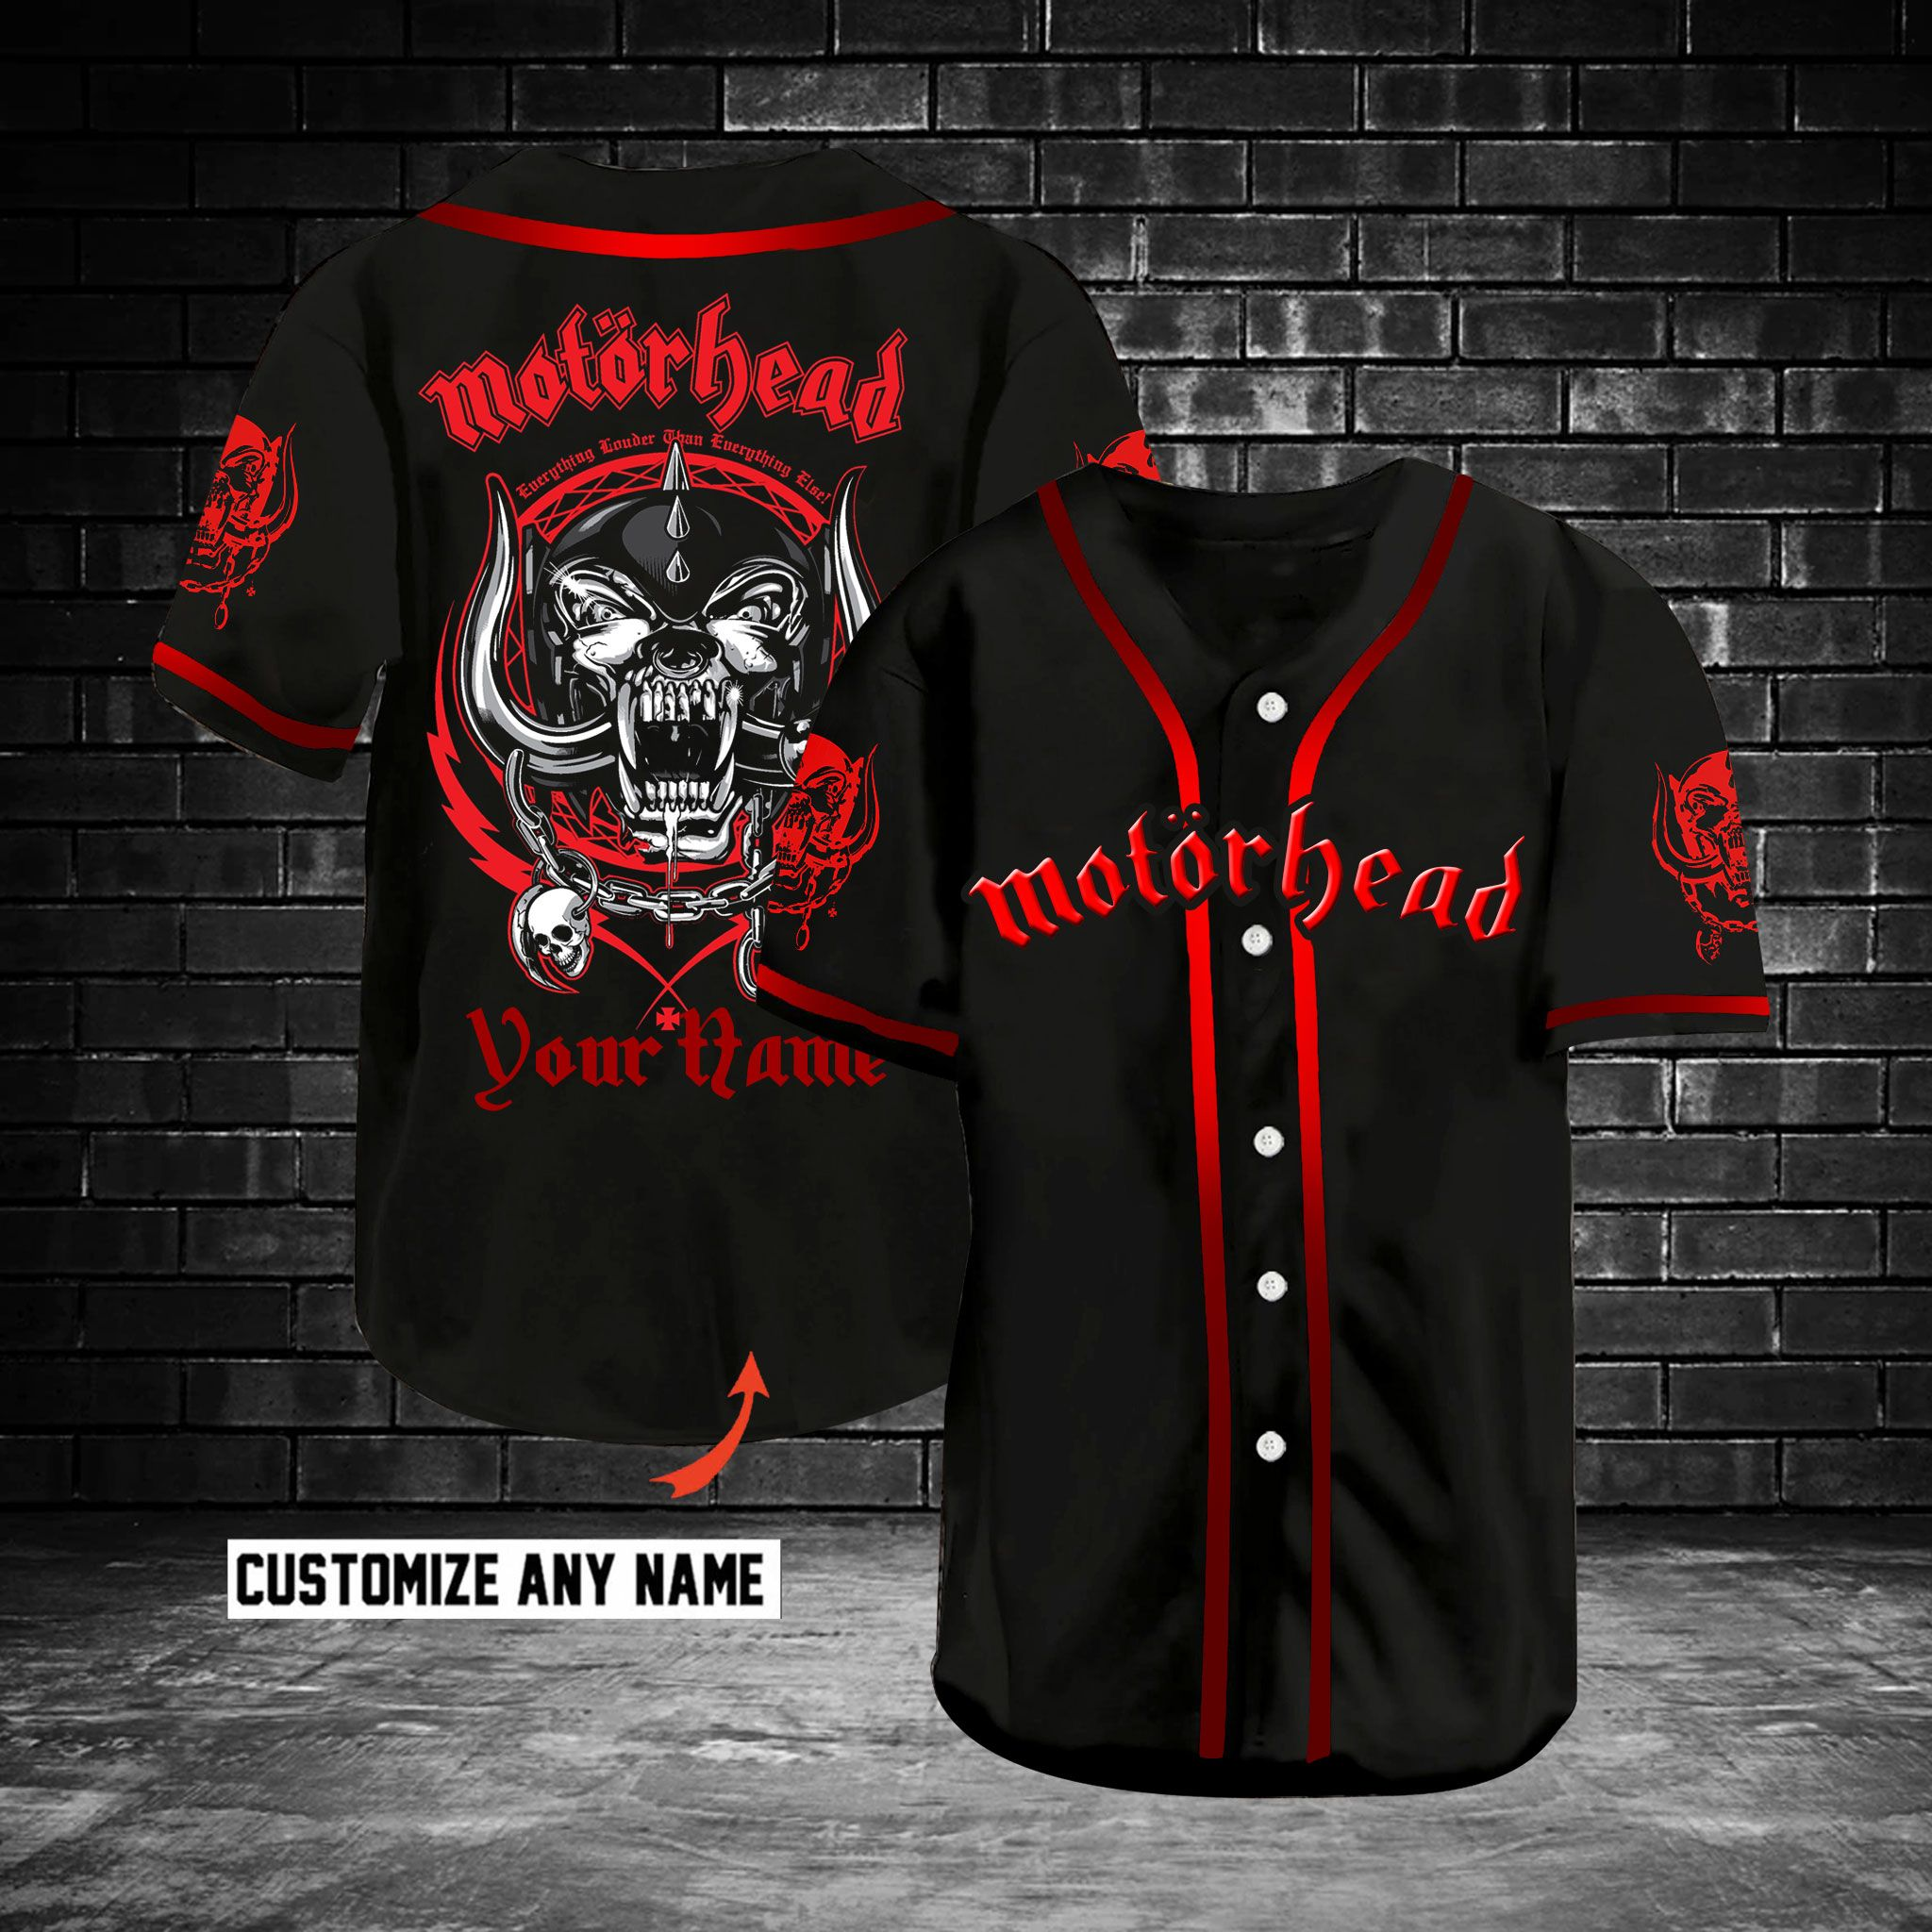 Motorhead Customize Name Baseball Jersey Shirt